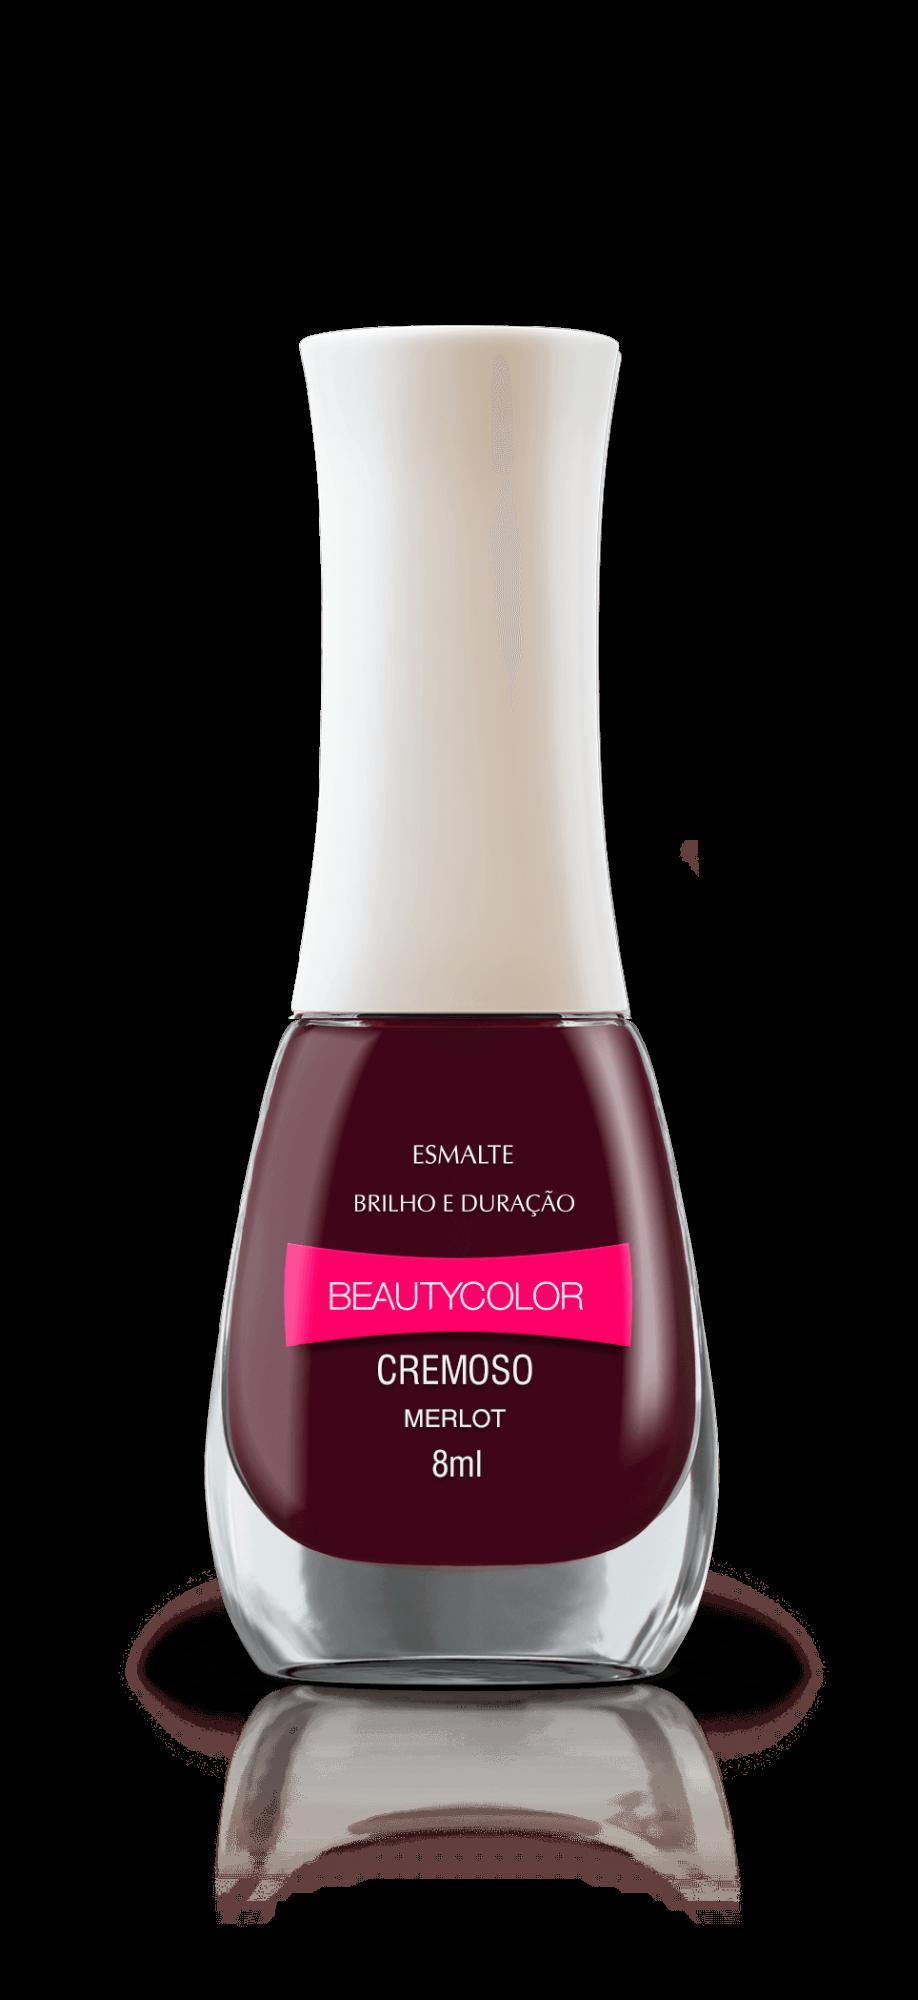 Merlot - Esmalte Beautycolor